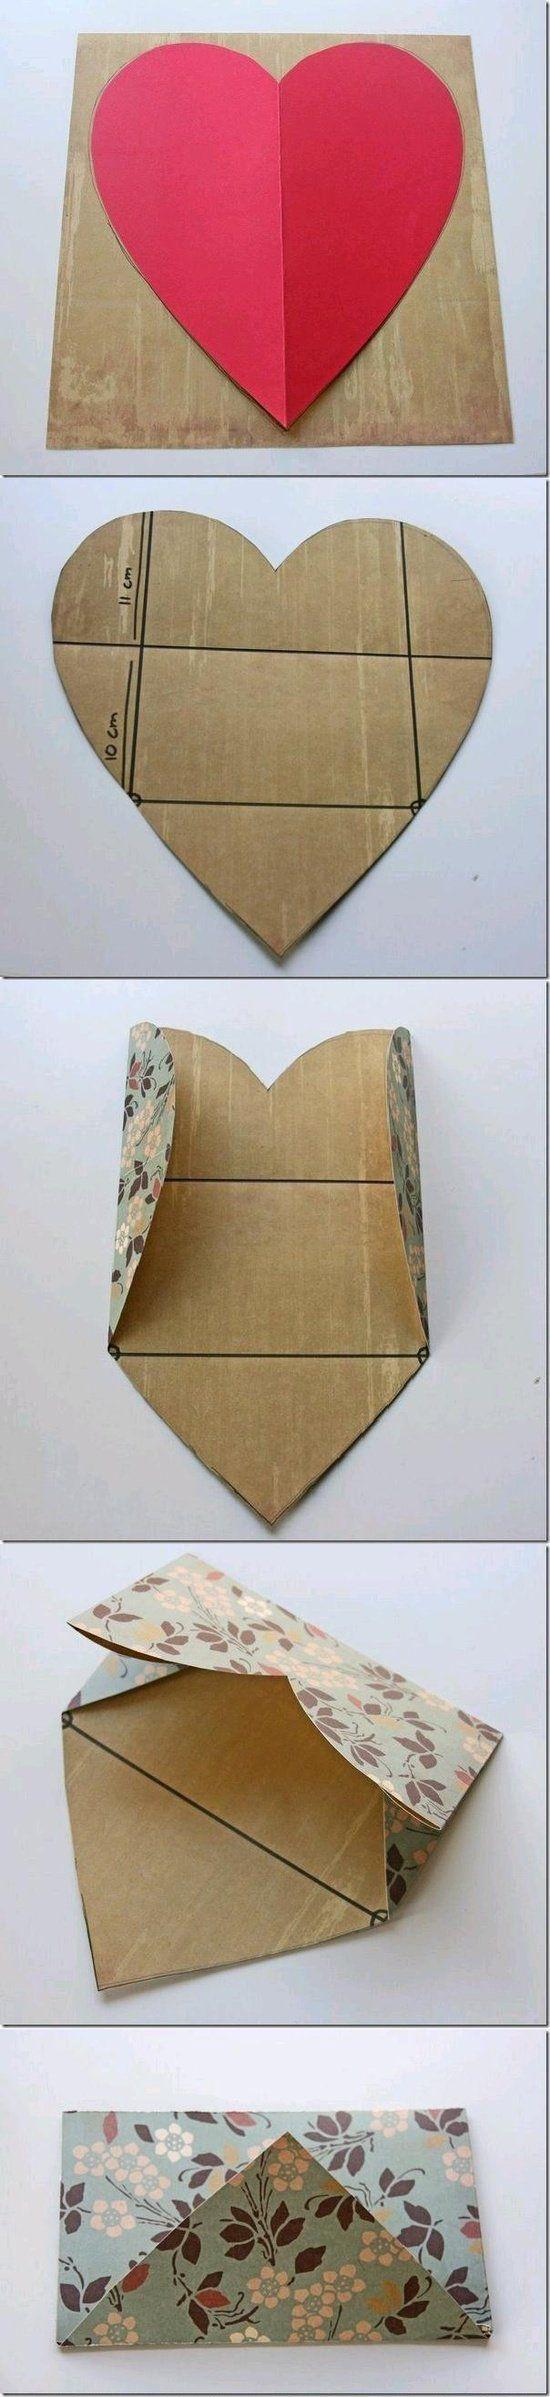 DIY � Create a nice envelope